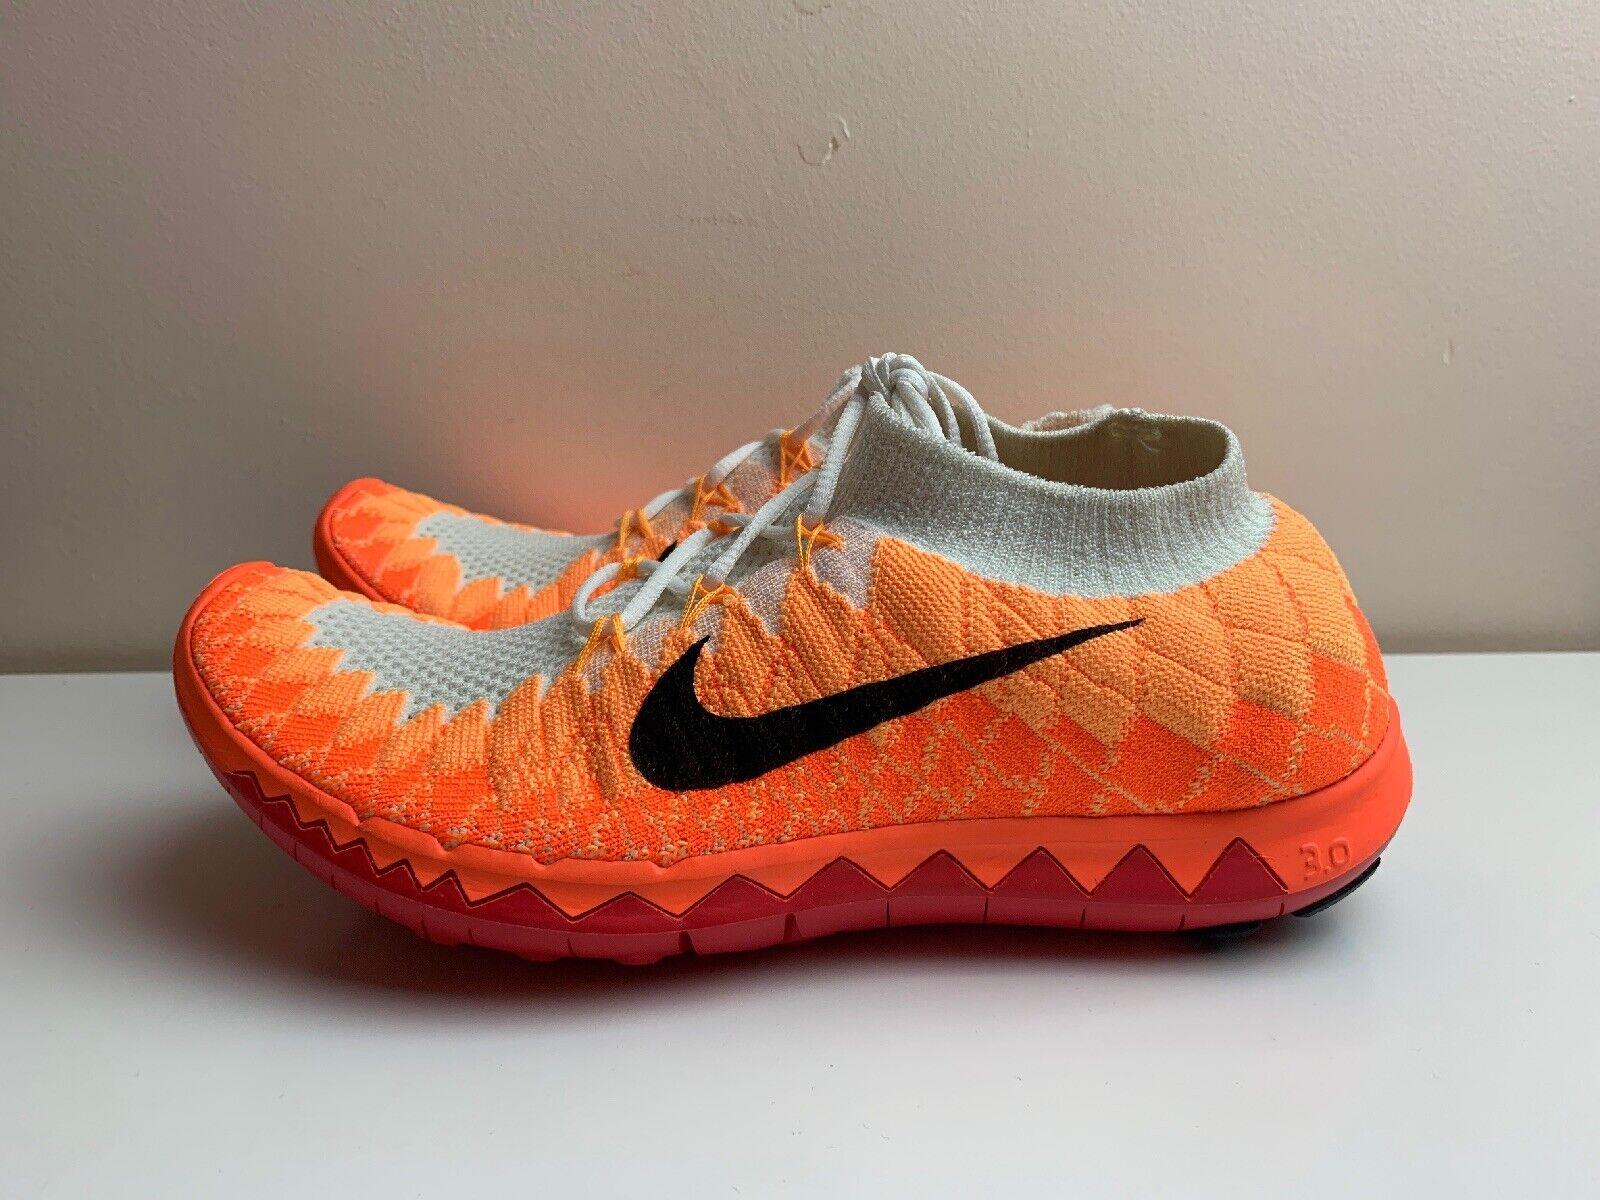 Nike Free Flystick 3.0 kvinnor kvinnor kvinnor Trainers orange gul UK 4 EUR 37.5 636231 101  för att ge dig en trevlig online shopping